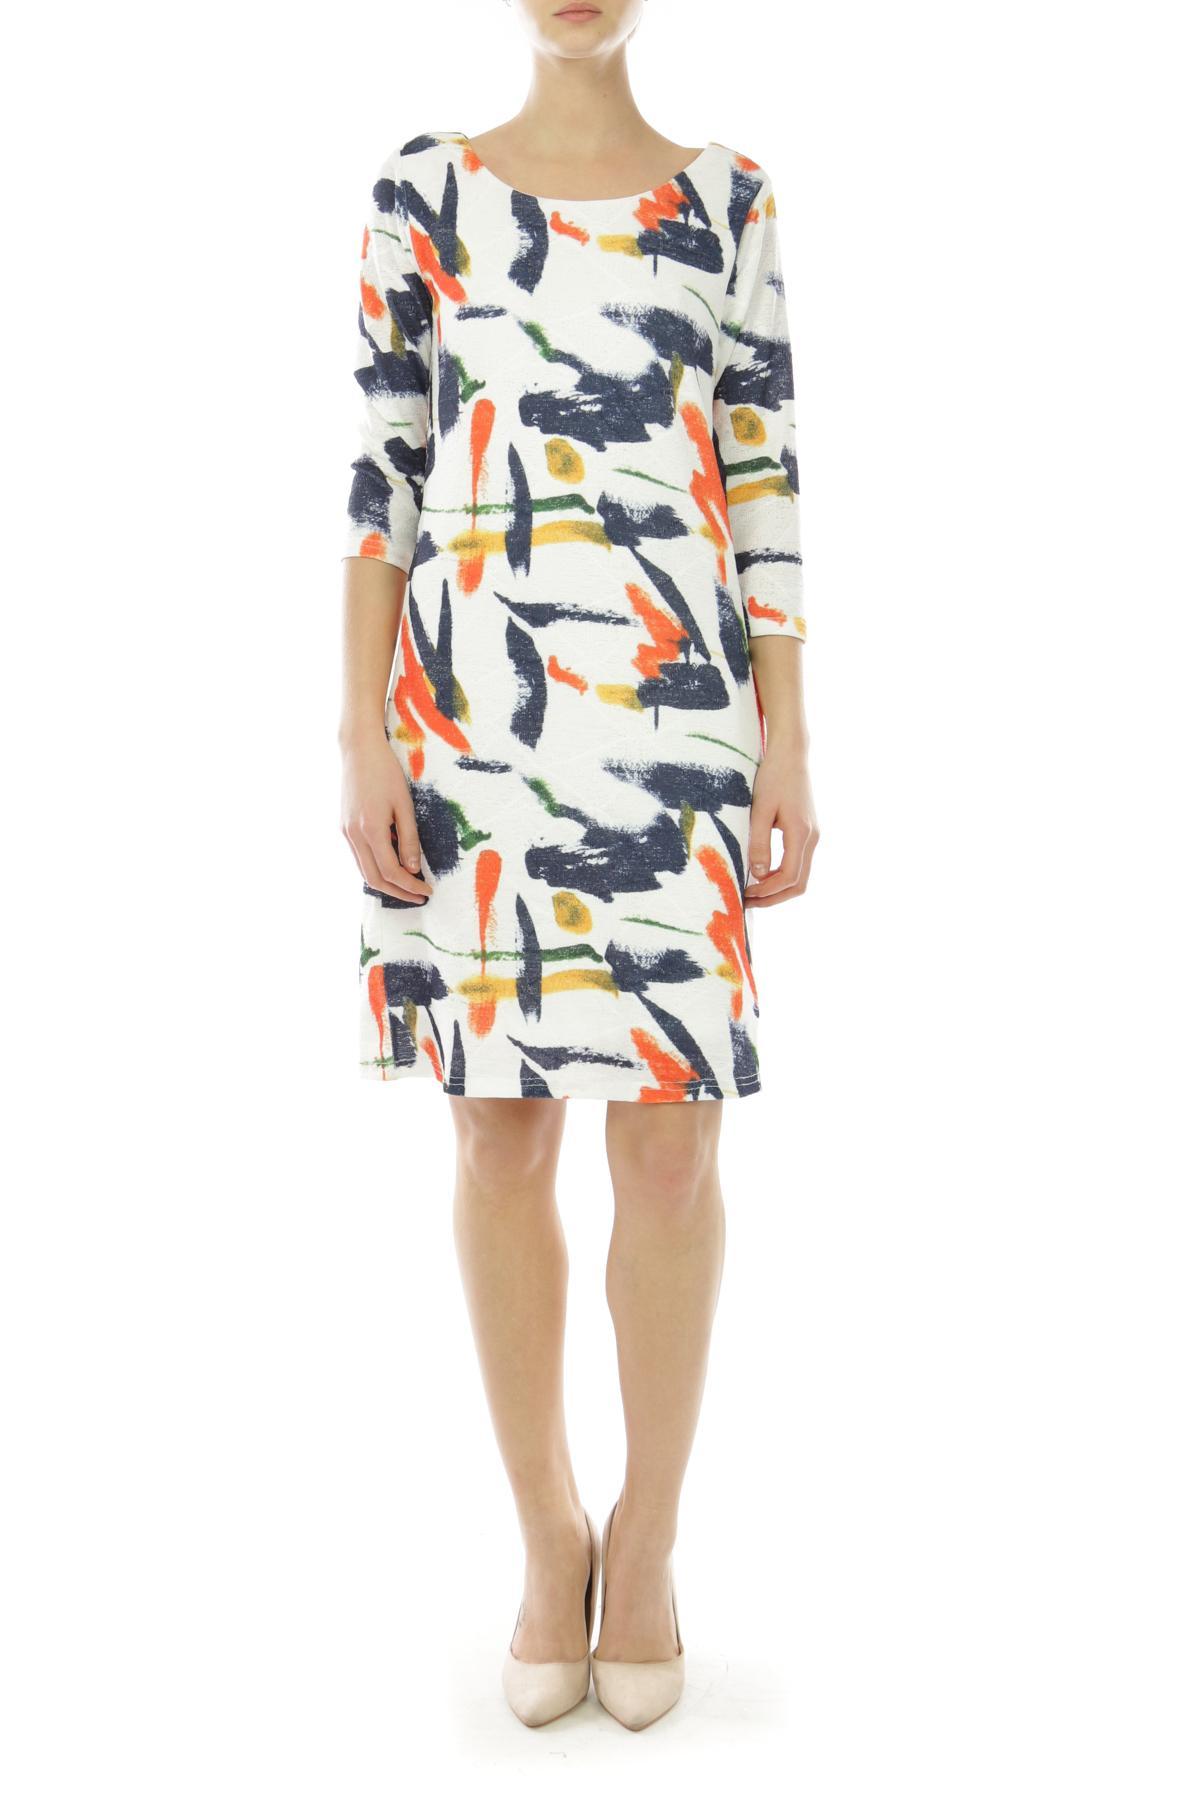 Robes longues Femme 2666-ORANGE For Her Paris (SHINIE)